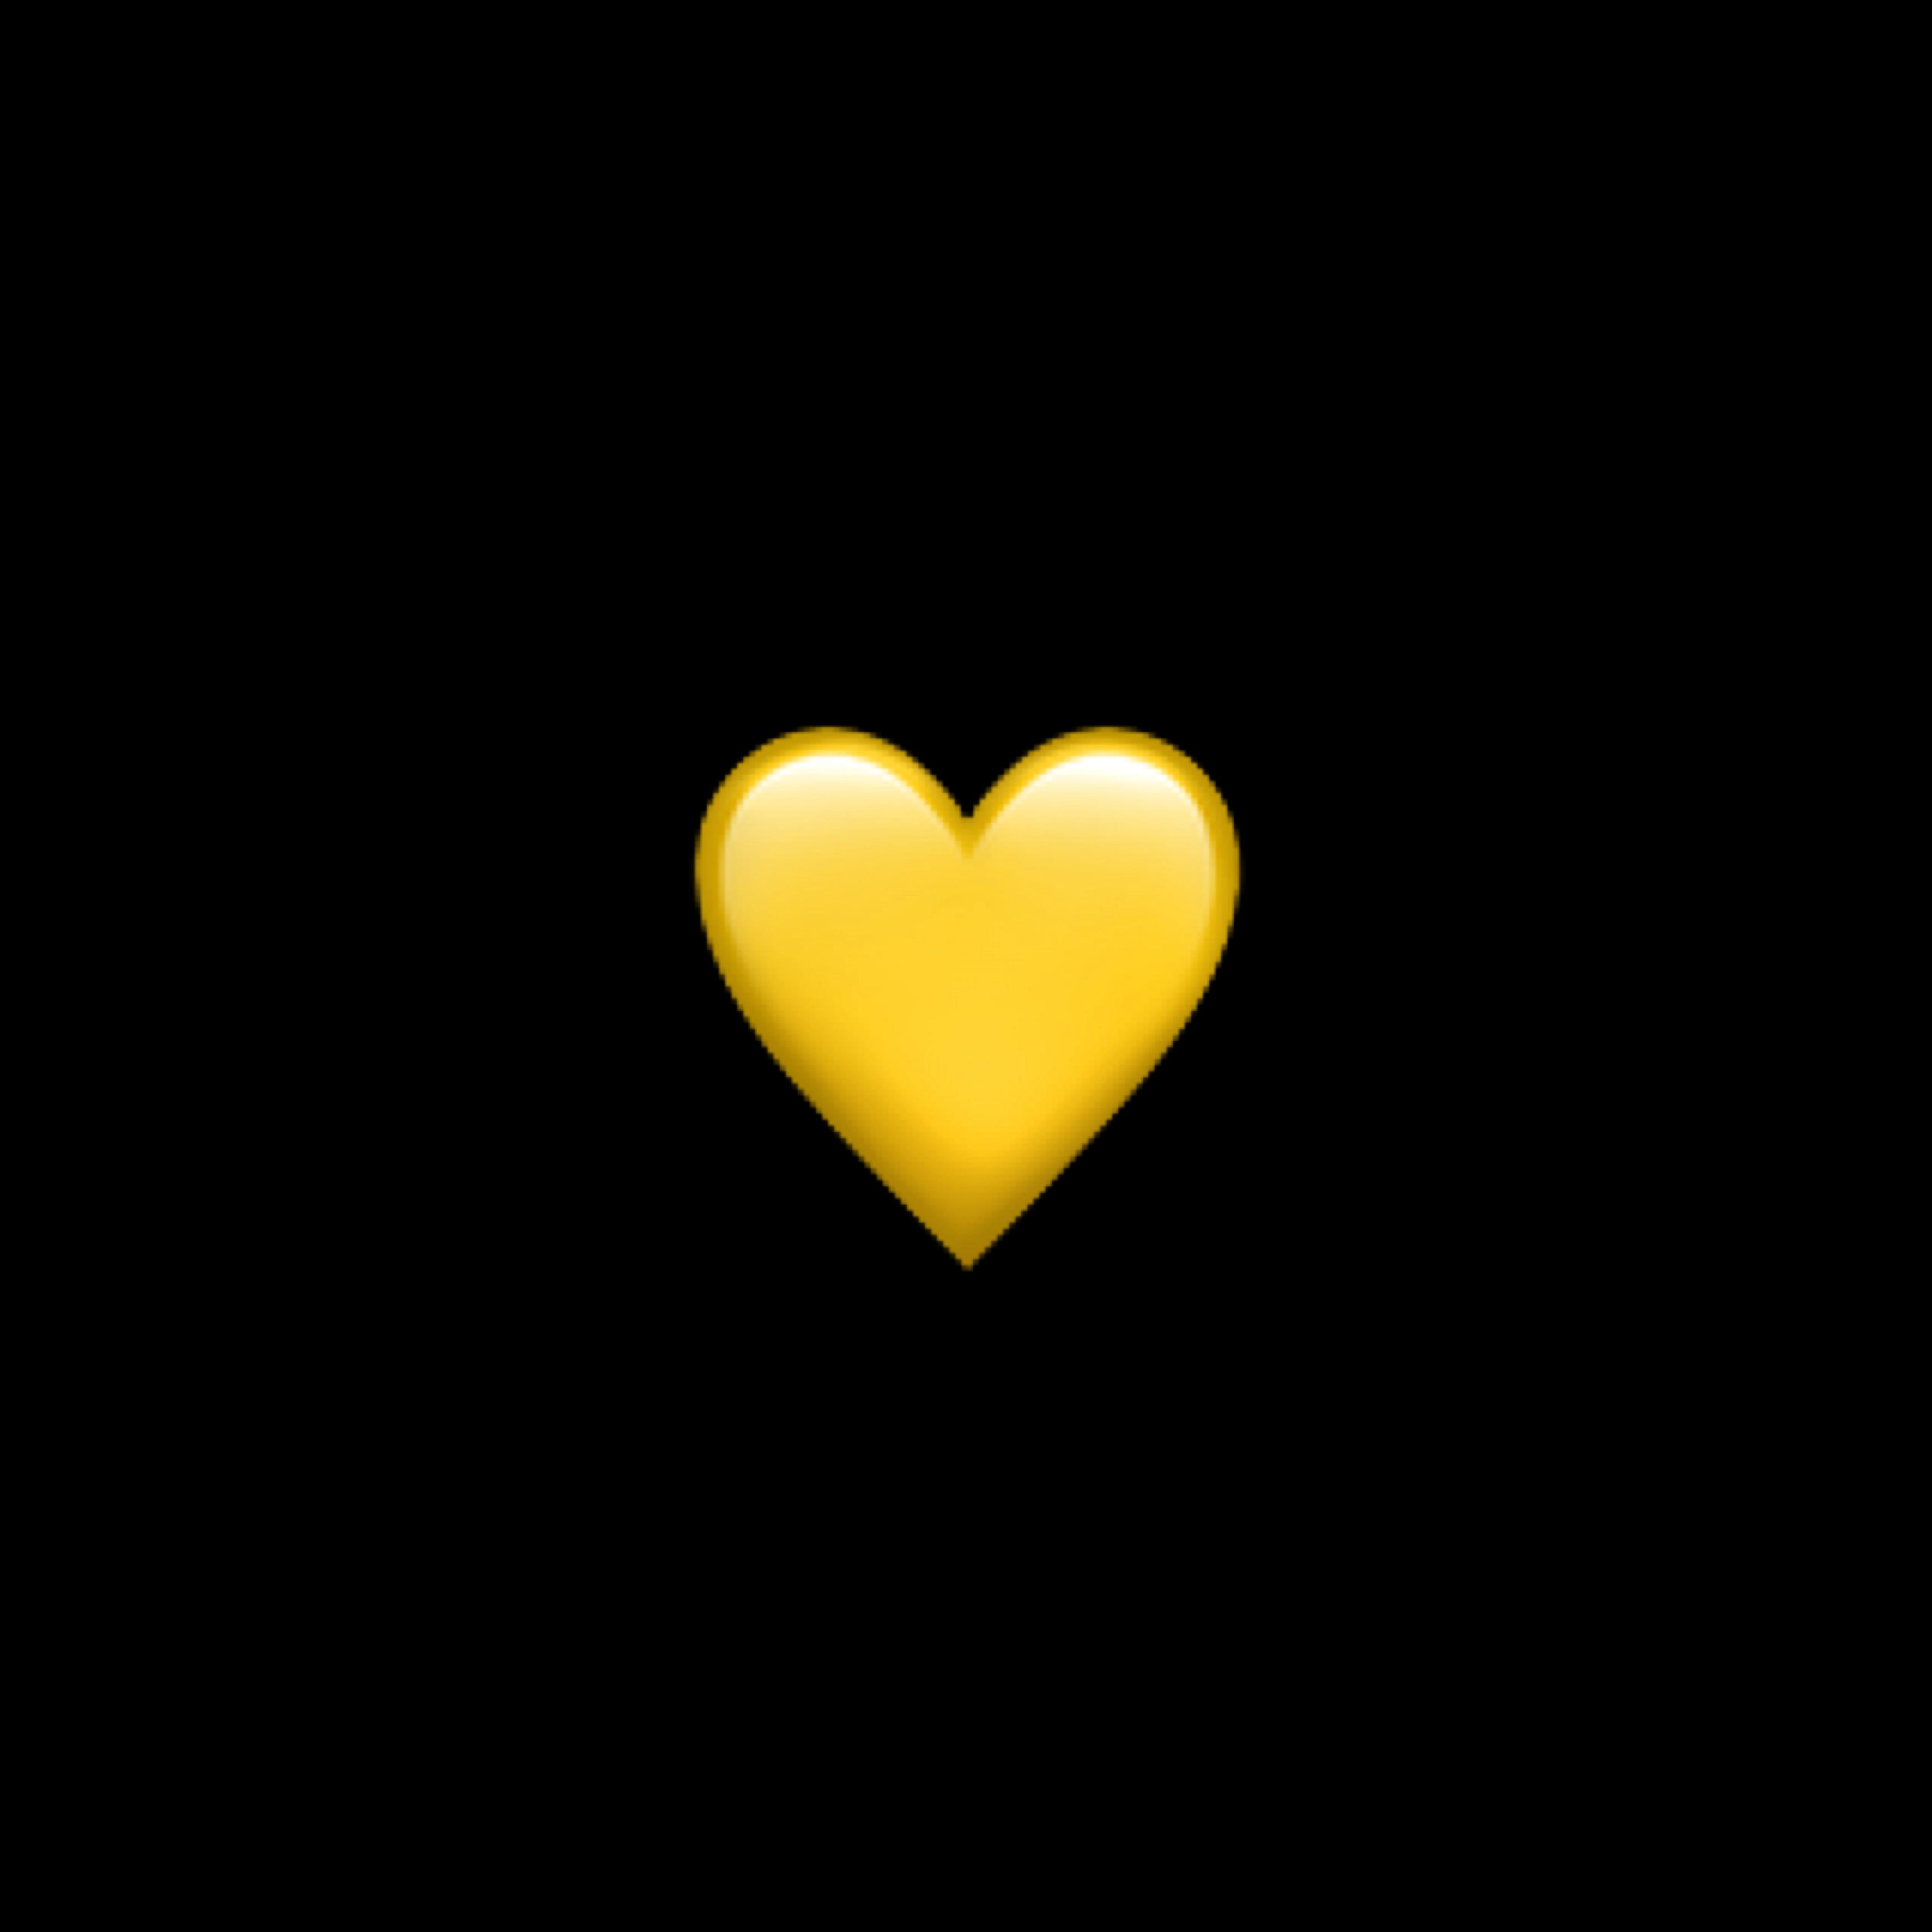 yellow heart emoji iphone freetoedit... Yellow Heart Emoji